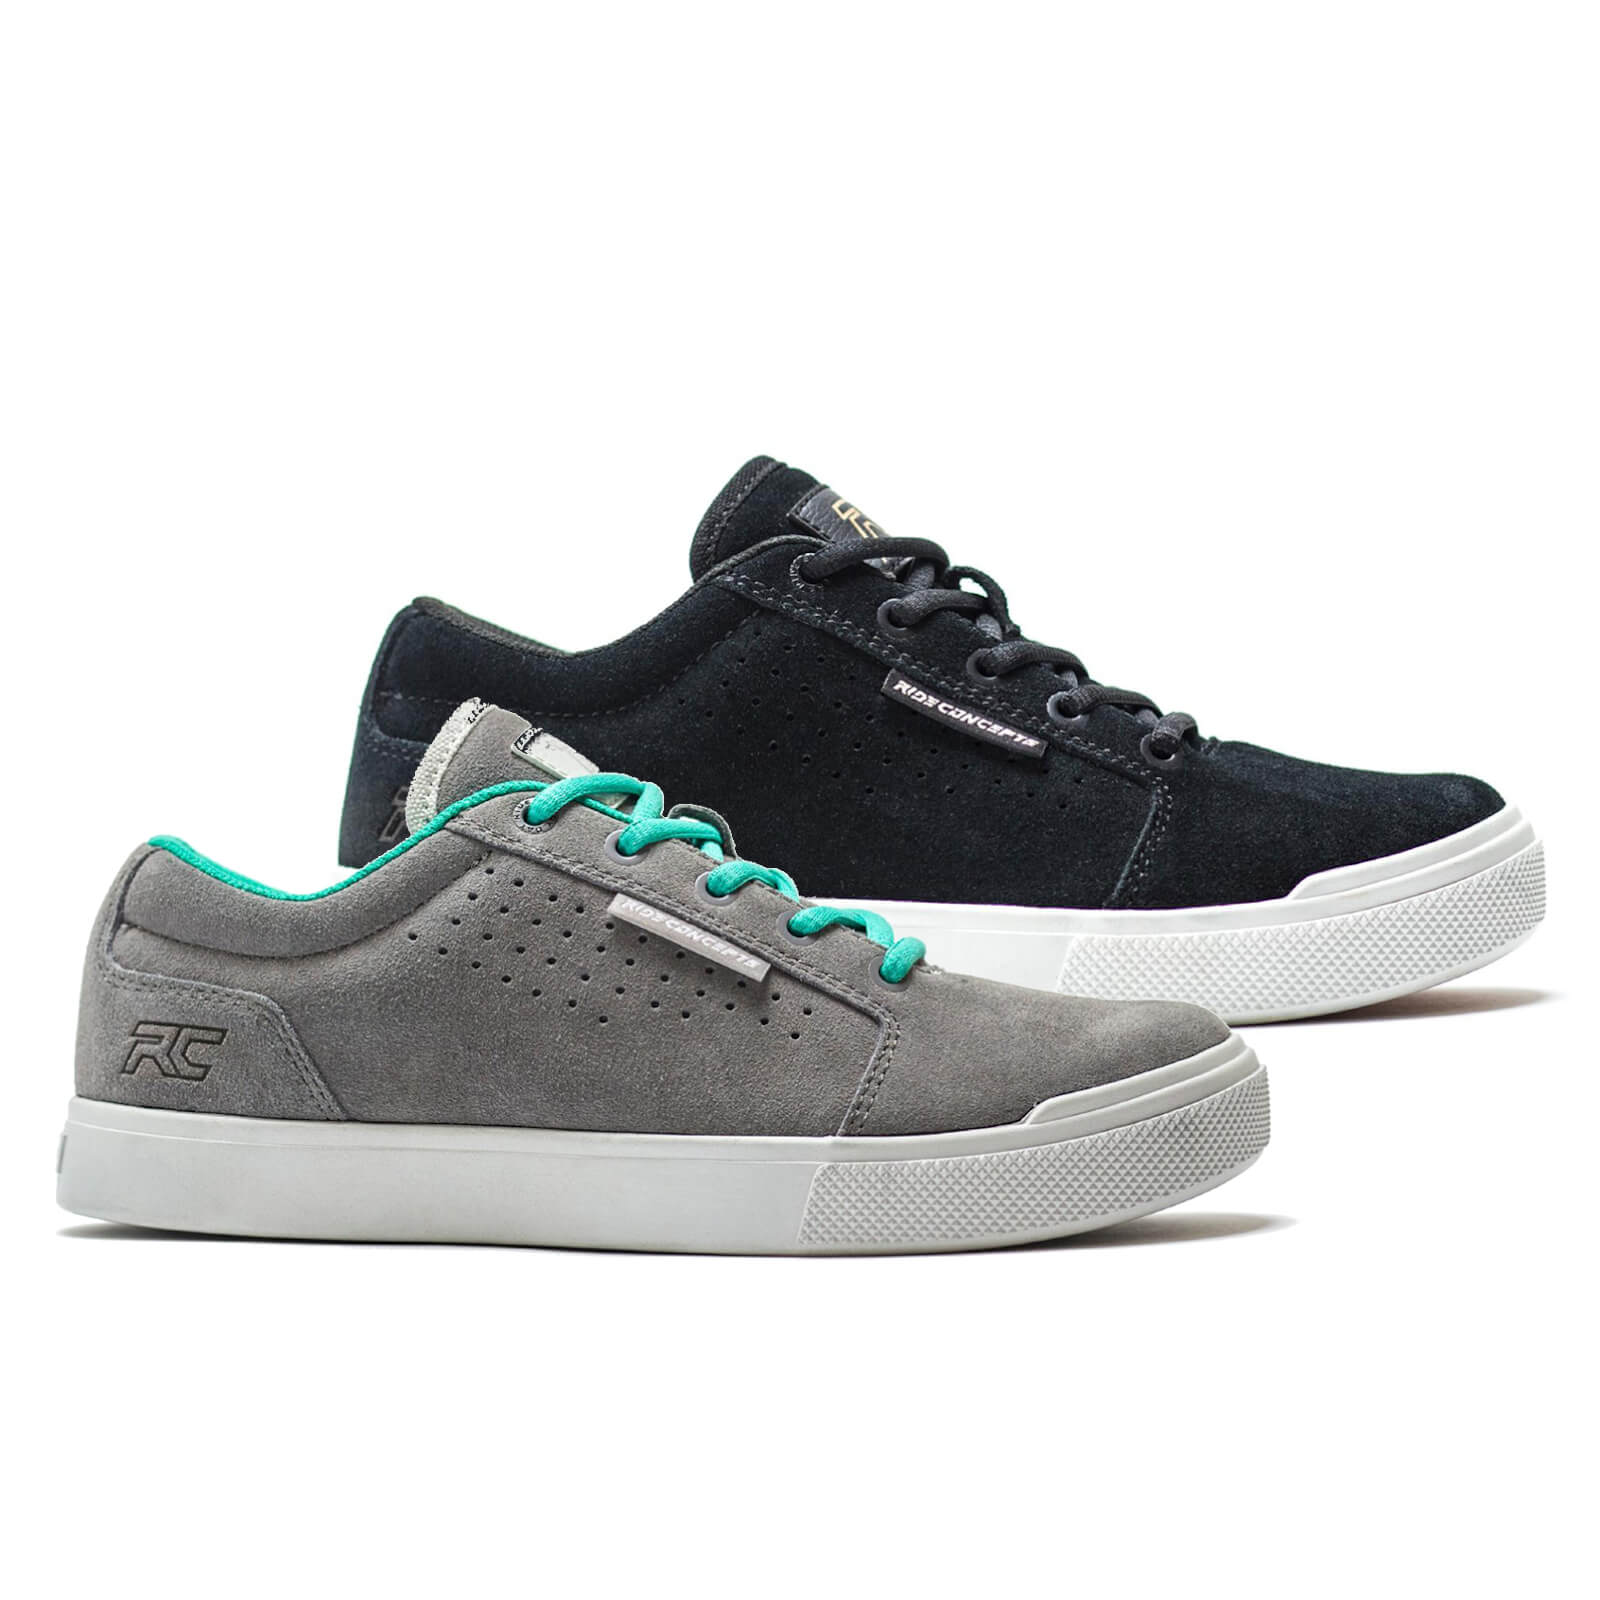 Ride Concepts Women's Vice Flat MTB Shoes - UK 5/EU 36 - Black